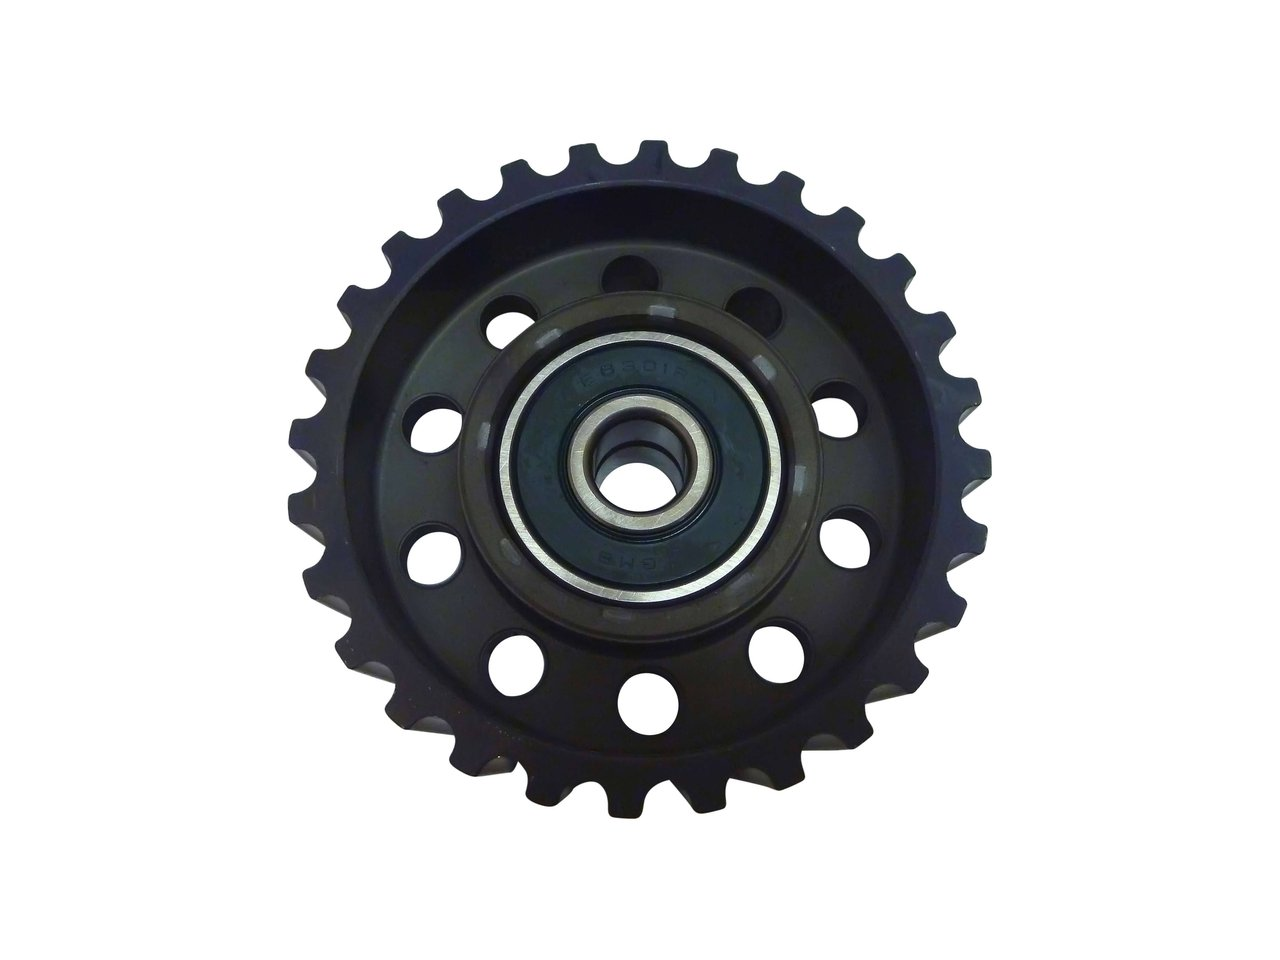 Timing Belt Idler Gear Suitable For Hilux Ln106 167 4runner Ln130 Gears Bundera